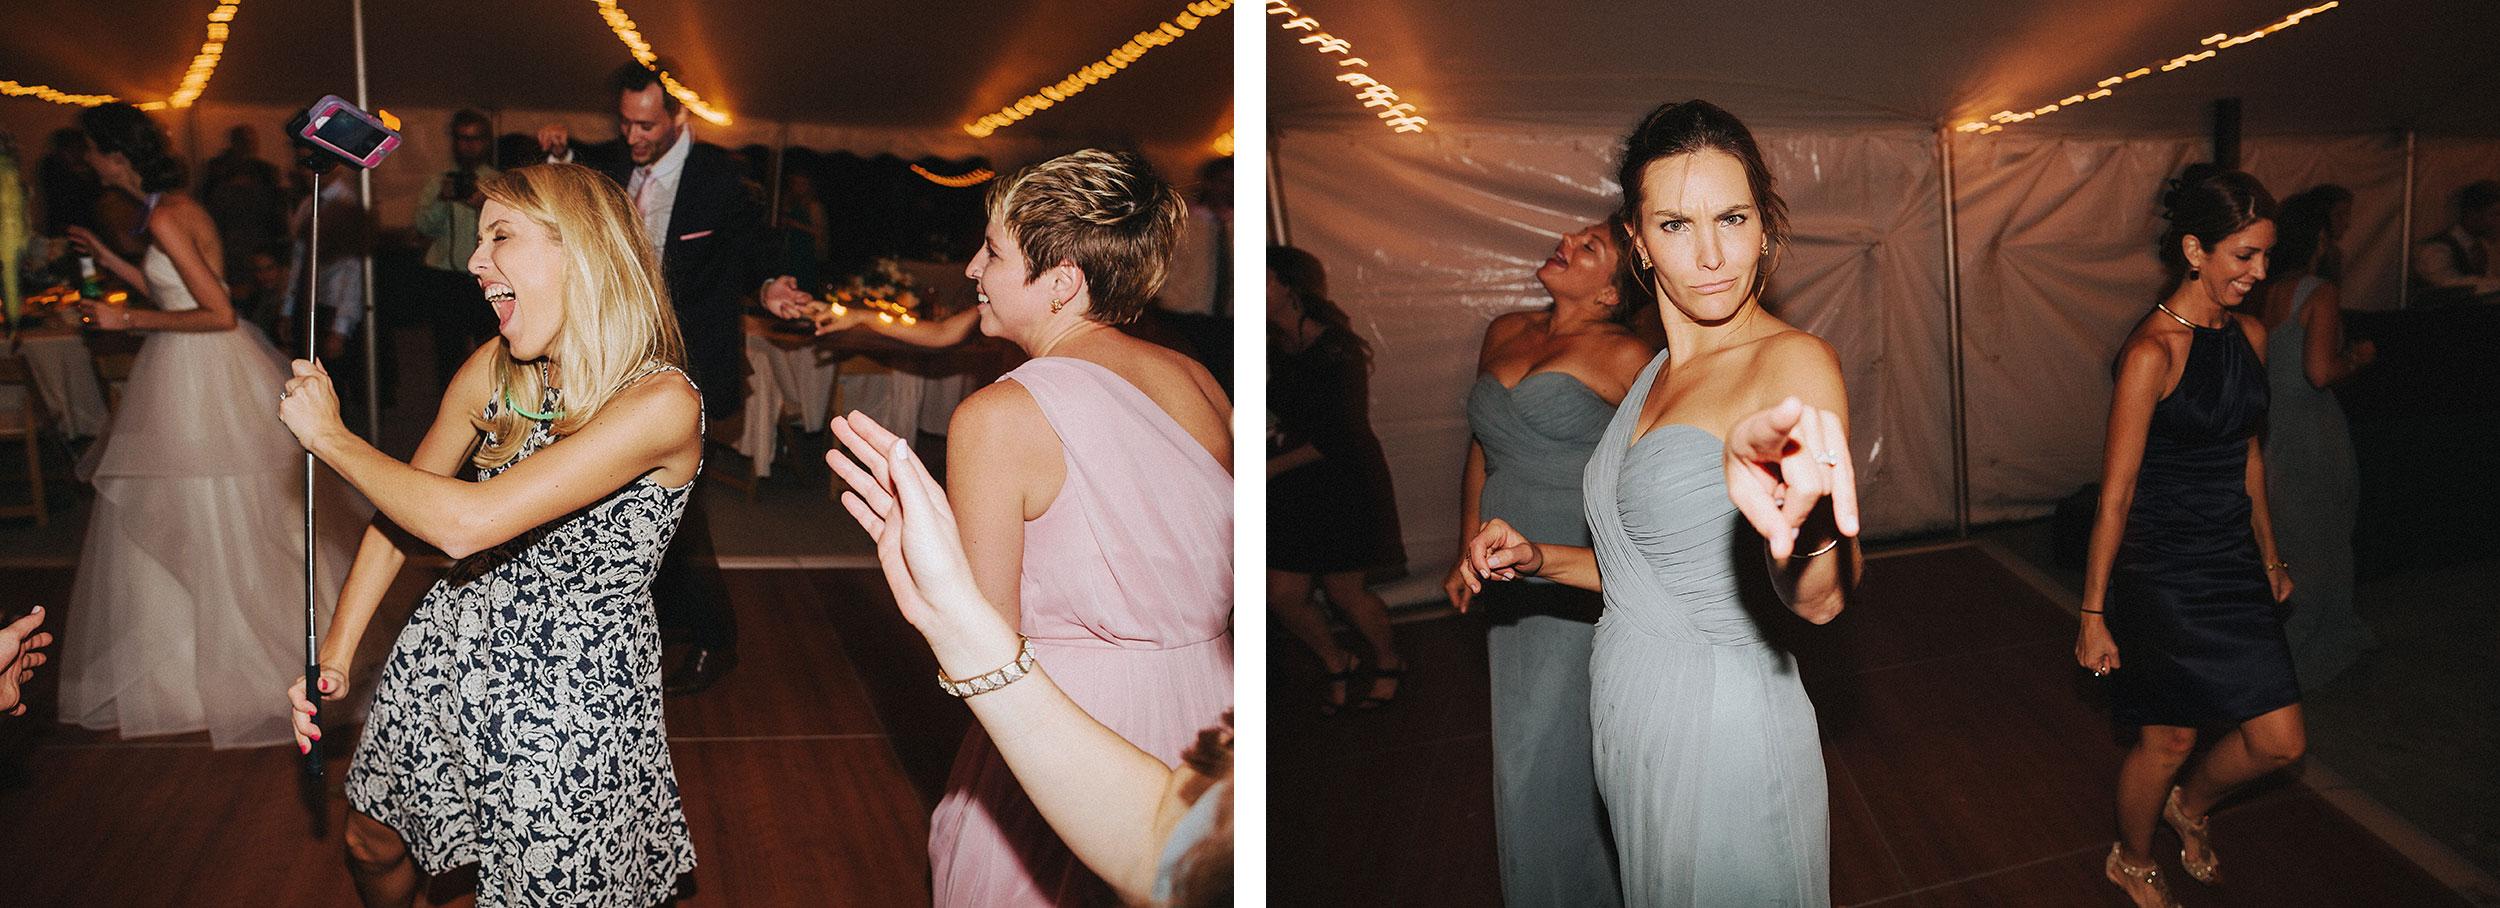 saxony-farm-wedding-photographer-32.JPG